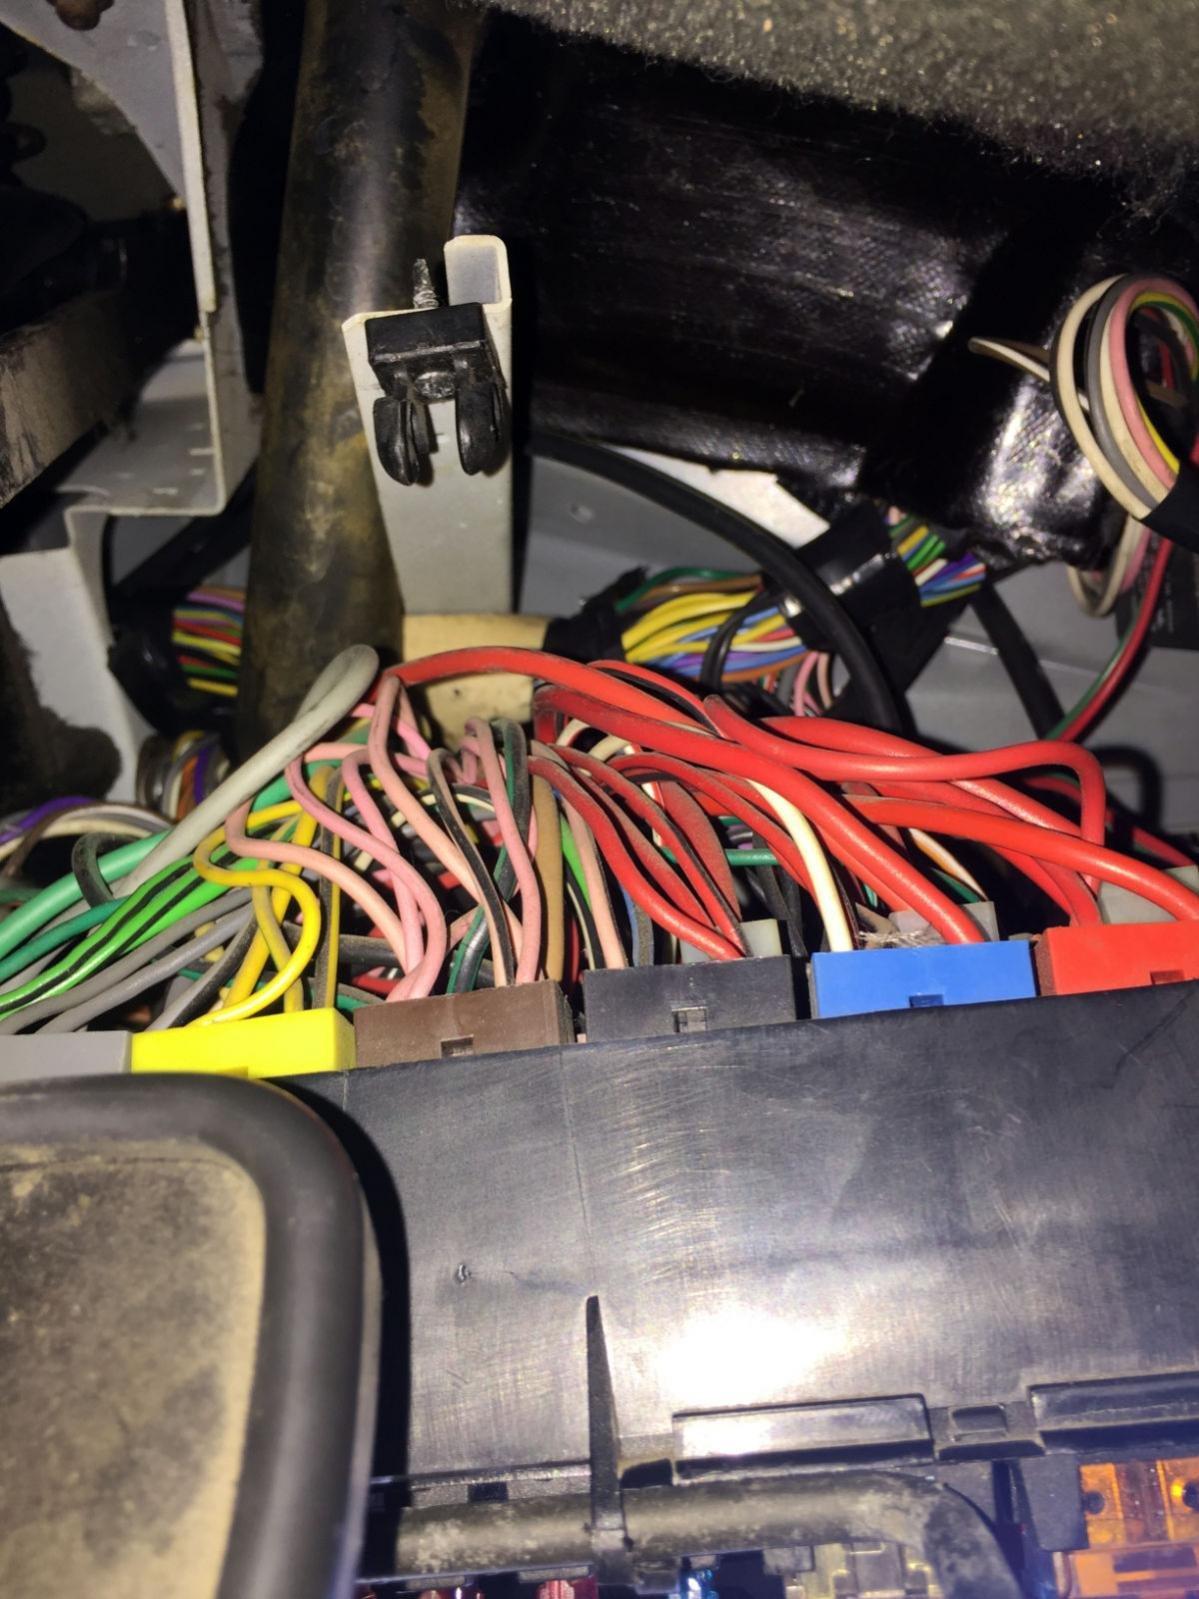 Fuse Box Wiring Clip - kapris-naehwelt